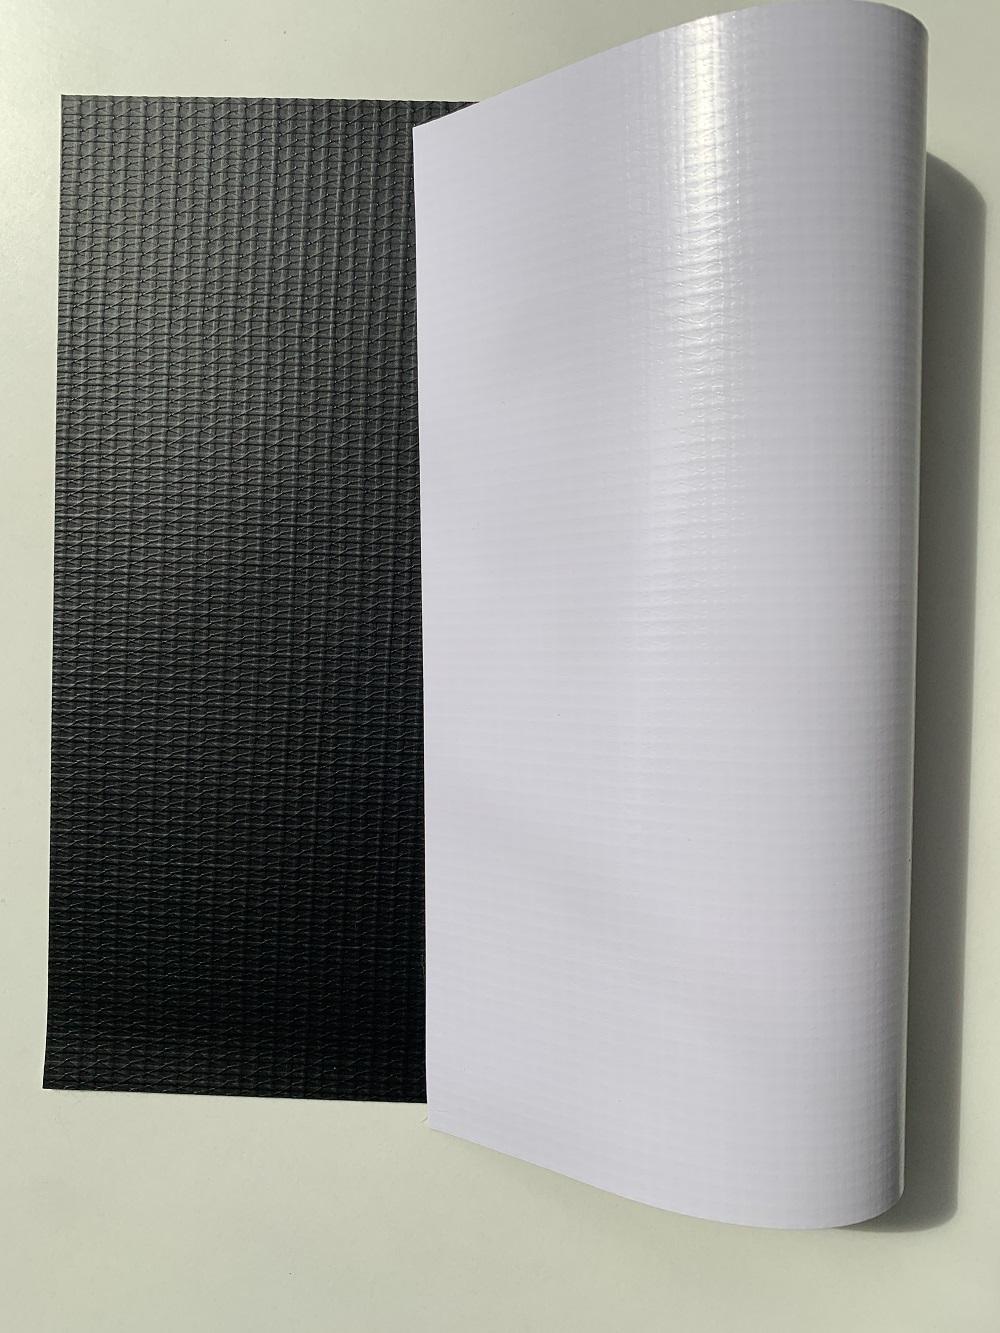 Lona Impressão Digital 260G Brilho F. Preto 200x300 5,00x50m